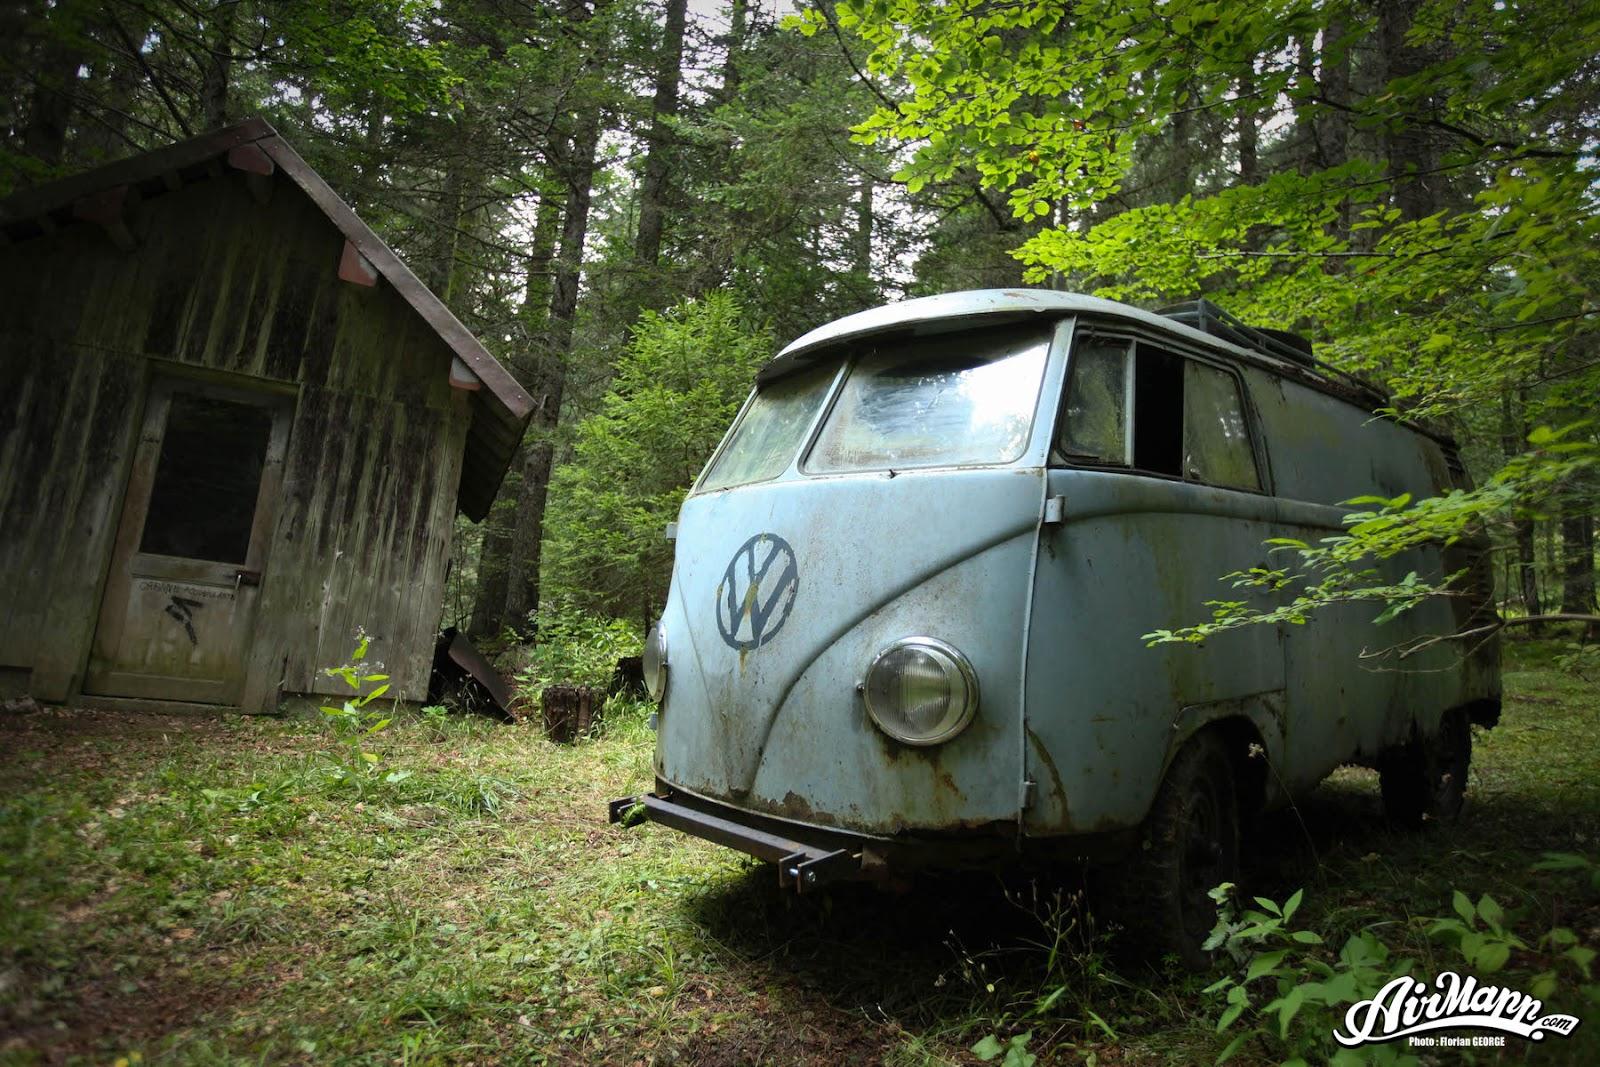 vw2Bmicrobus3 Η απίστευτη ιστορία ενός VW που δούλεψε μετά από 40 χρόνια Caber Van, Camper Van, Fun, VAN, videos, Volkswagen, Volkswagen Microbus, VW, VW Panelvan, VW Transporter, zblog